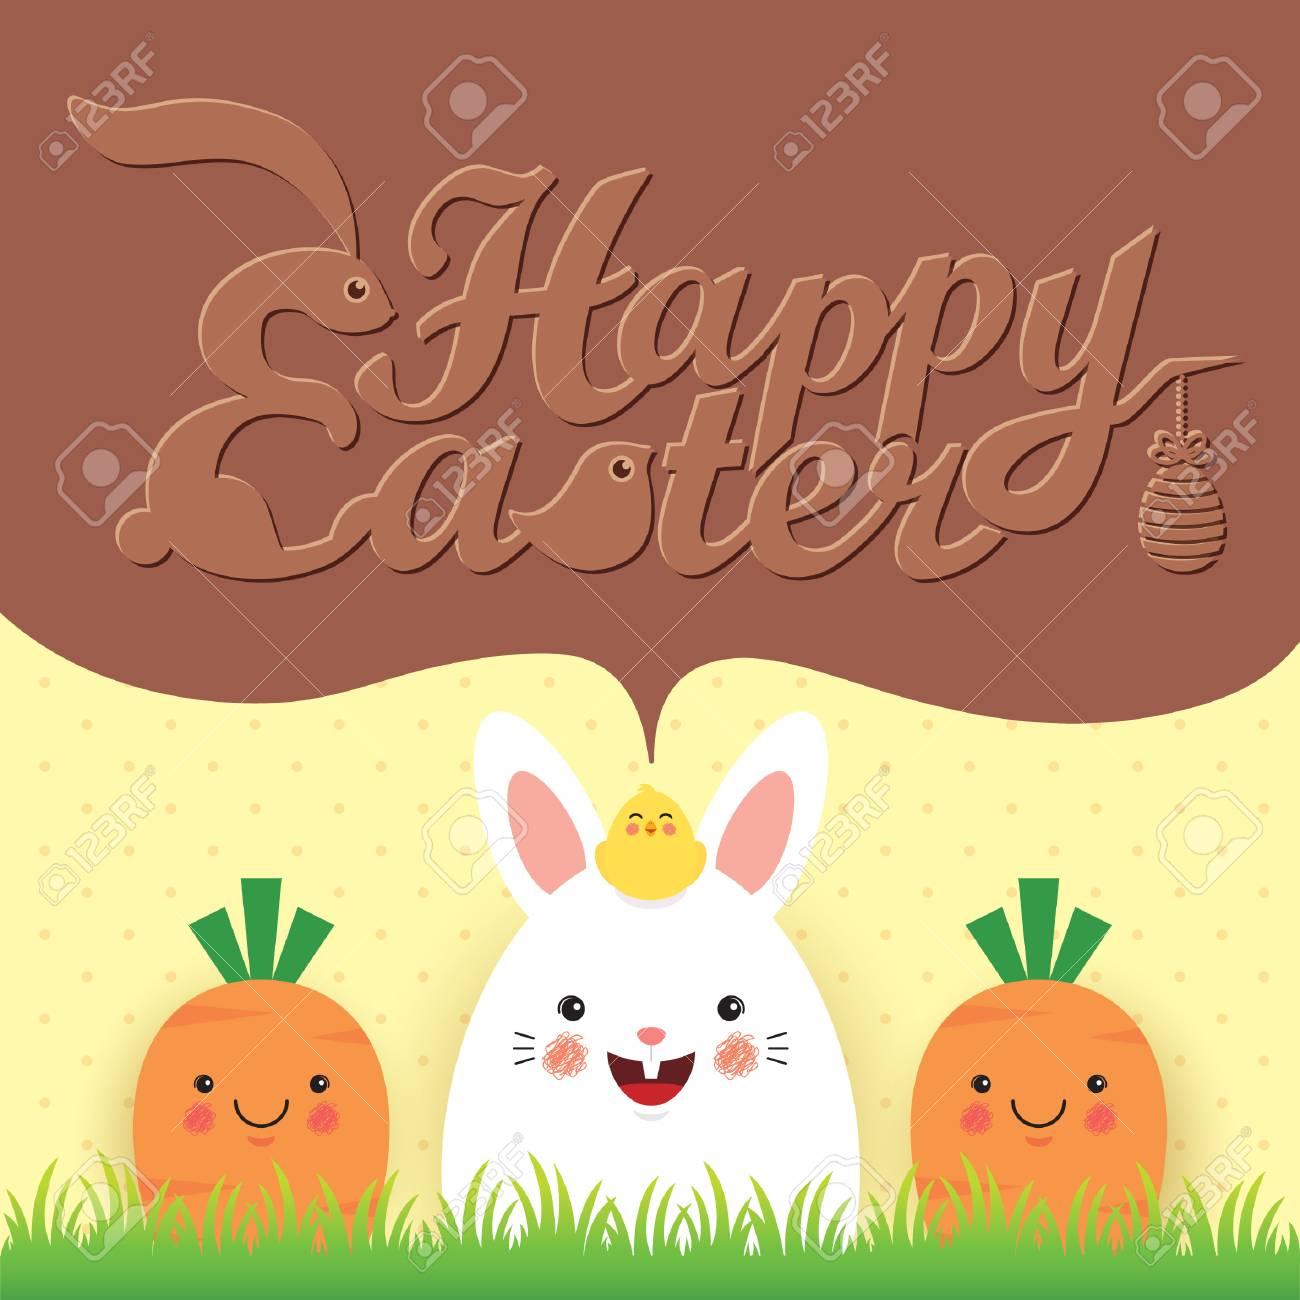 easter greeting card template design cute cartoon rabbit baby